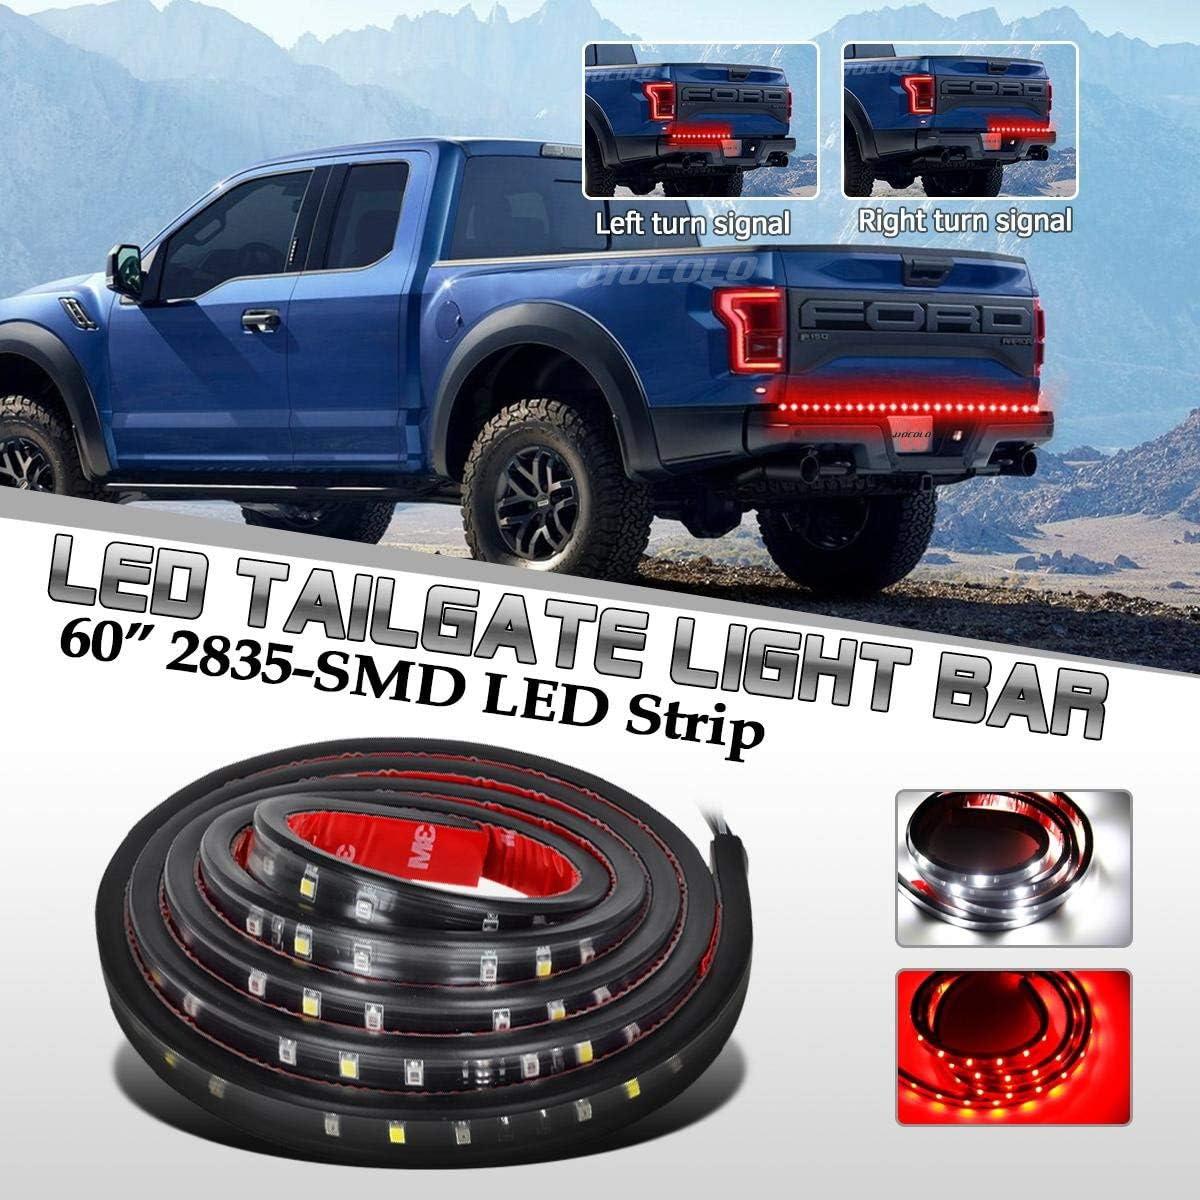 "HOCOLO 60"" LED Tailgate Light Bar Truck Tail Light LED Strip Red/White Reverse Brake Turn Signal Light Universal for Jeep Chevy GMC Ford Dodge Ram Pickup Trucks RV SUV"